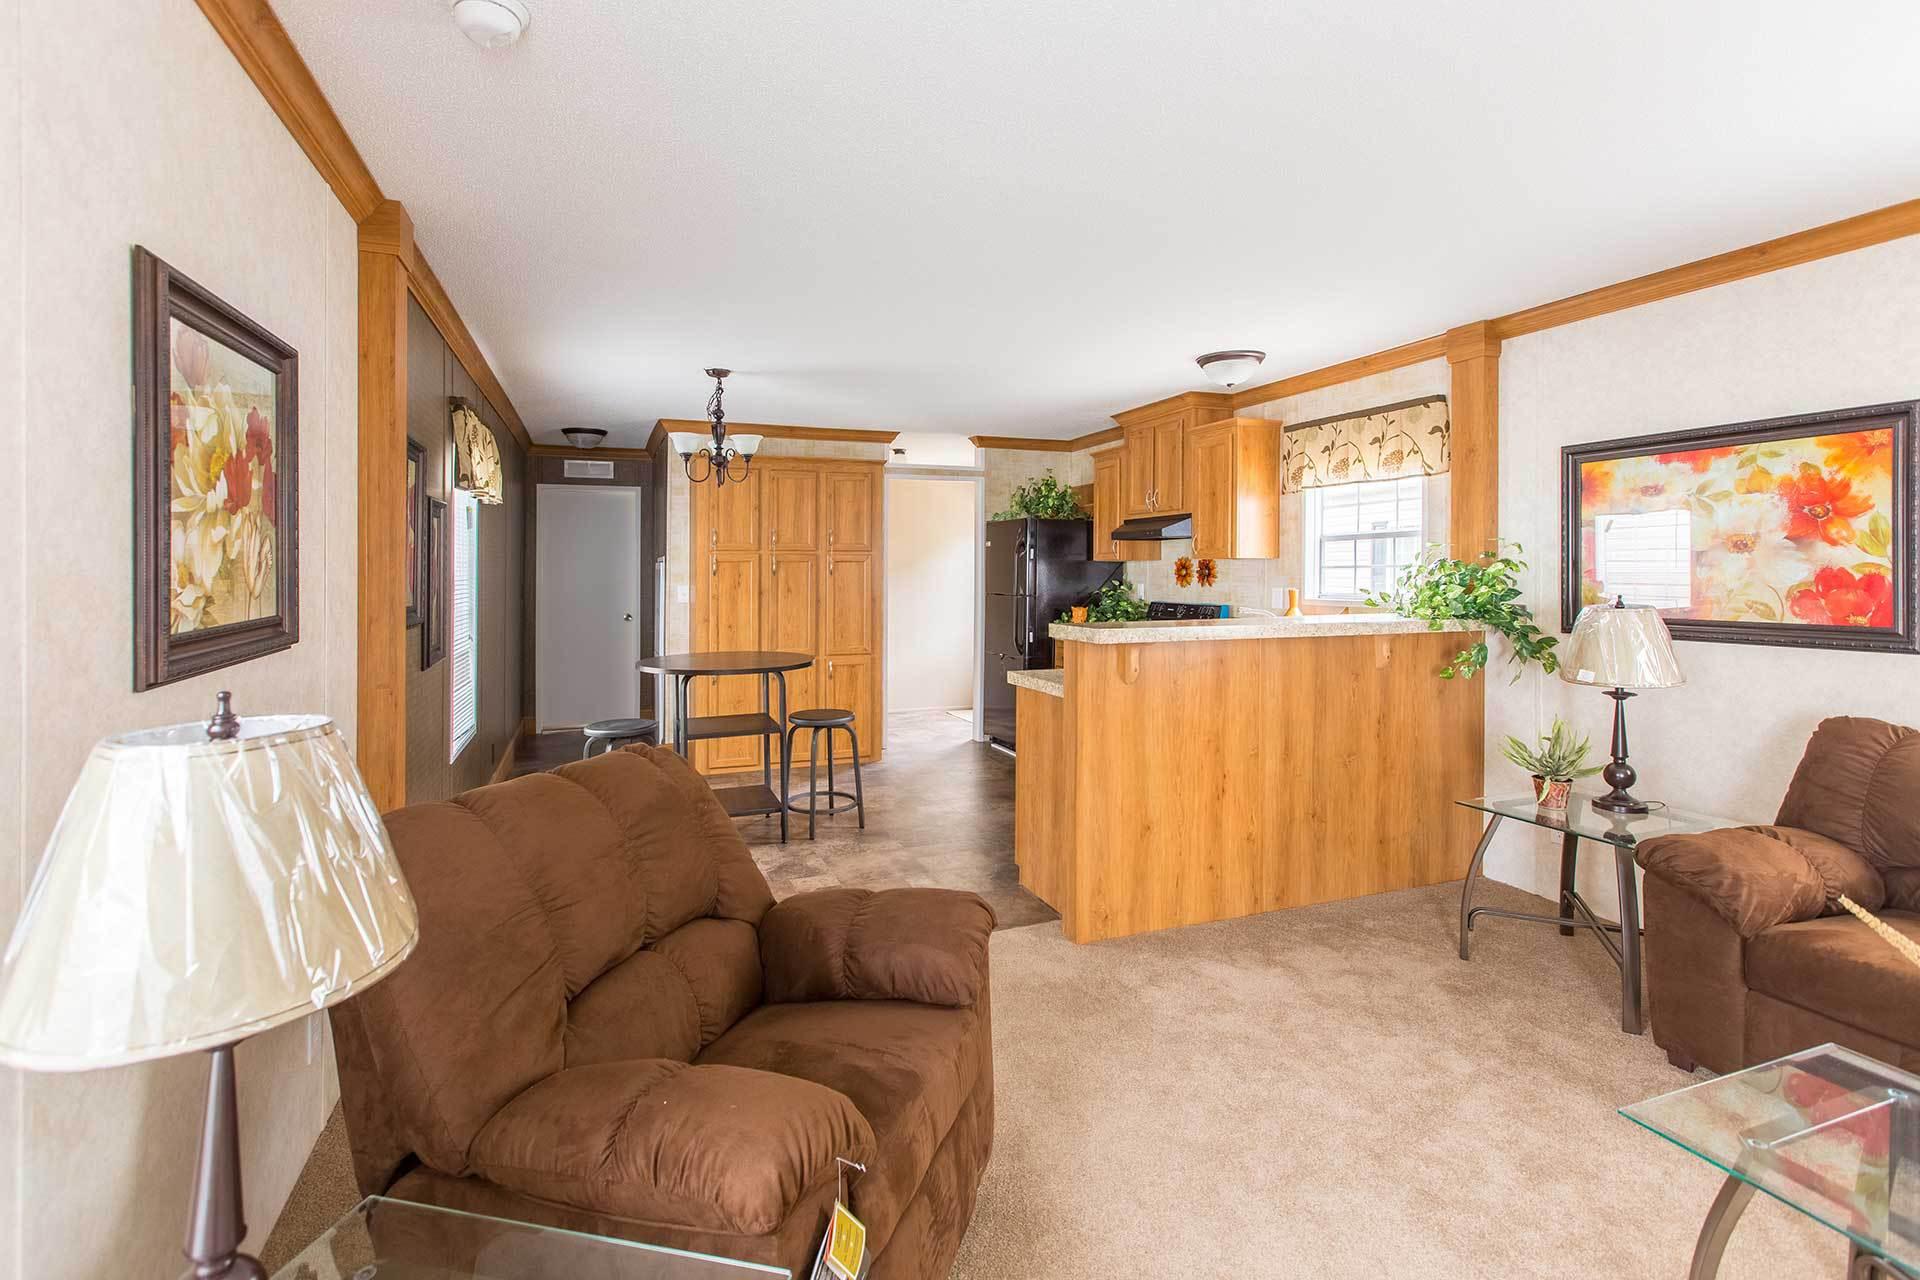 prefabricated homes for sale - Pensacola, FL